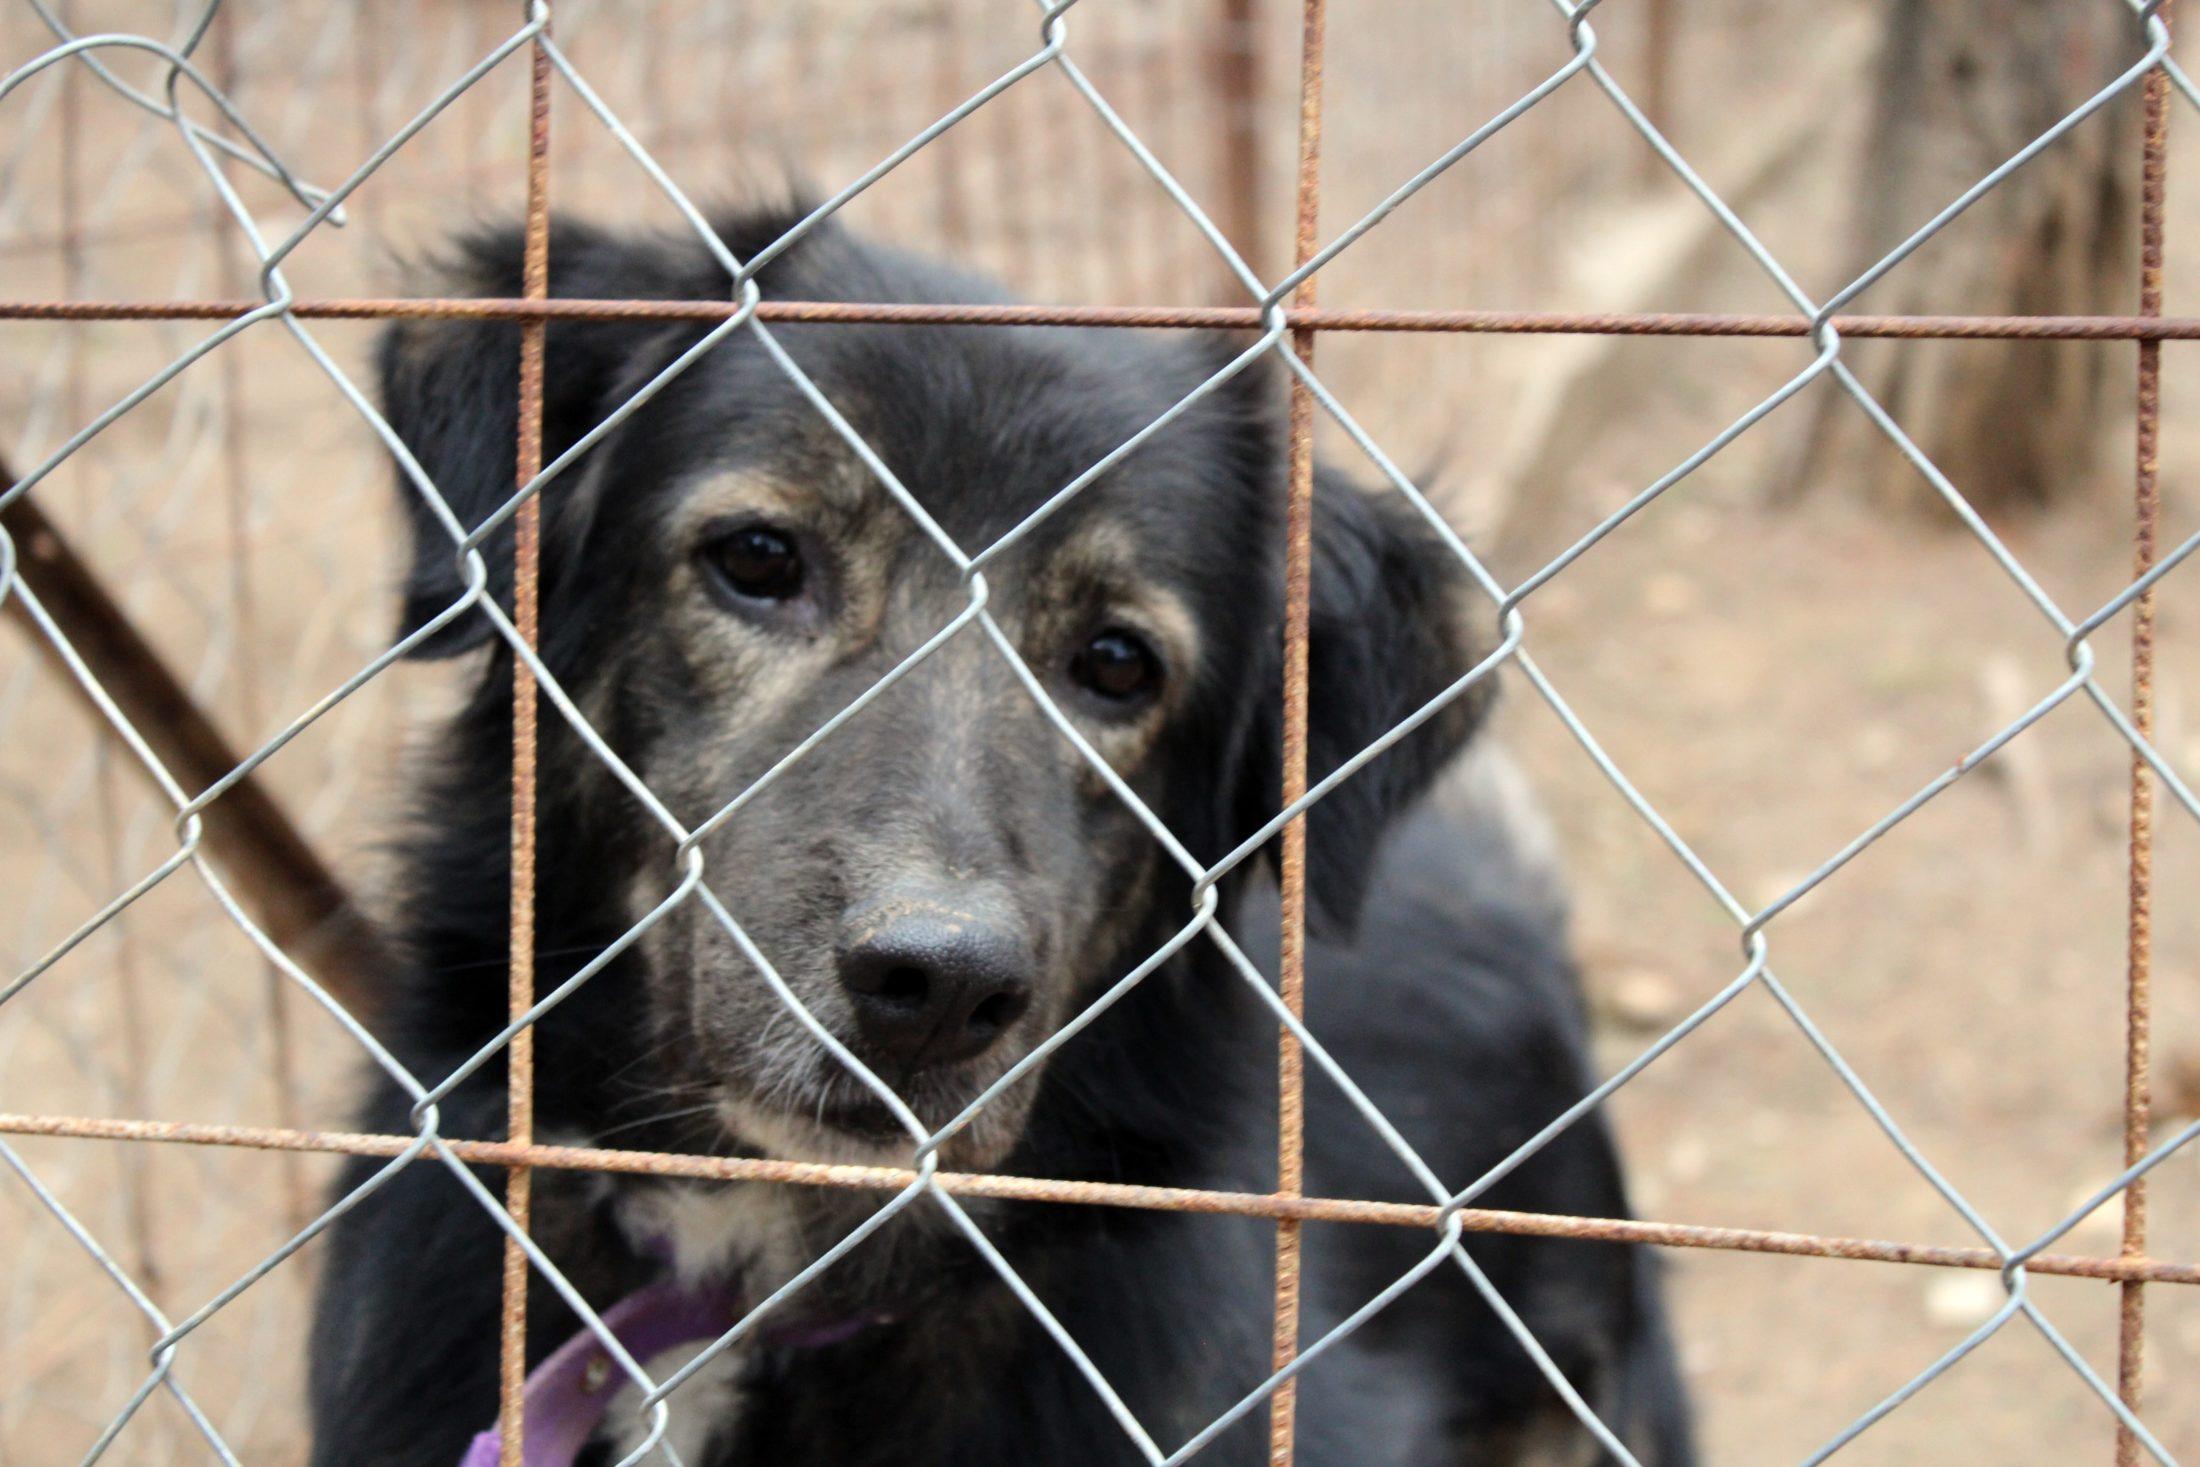 animal preso em canil para cachorro